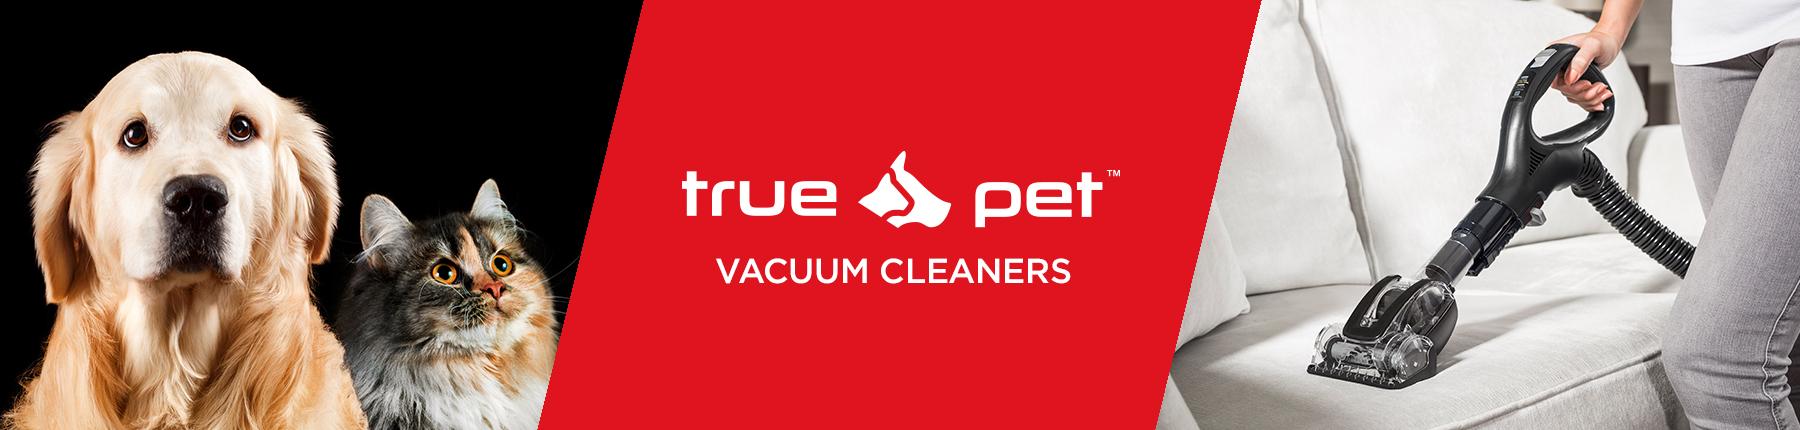 Shark Vacuum Cleaners with TruePet